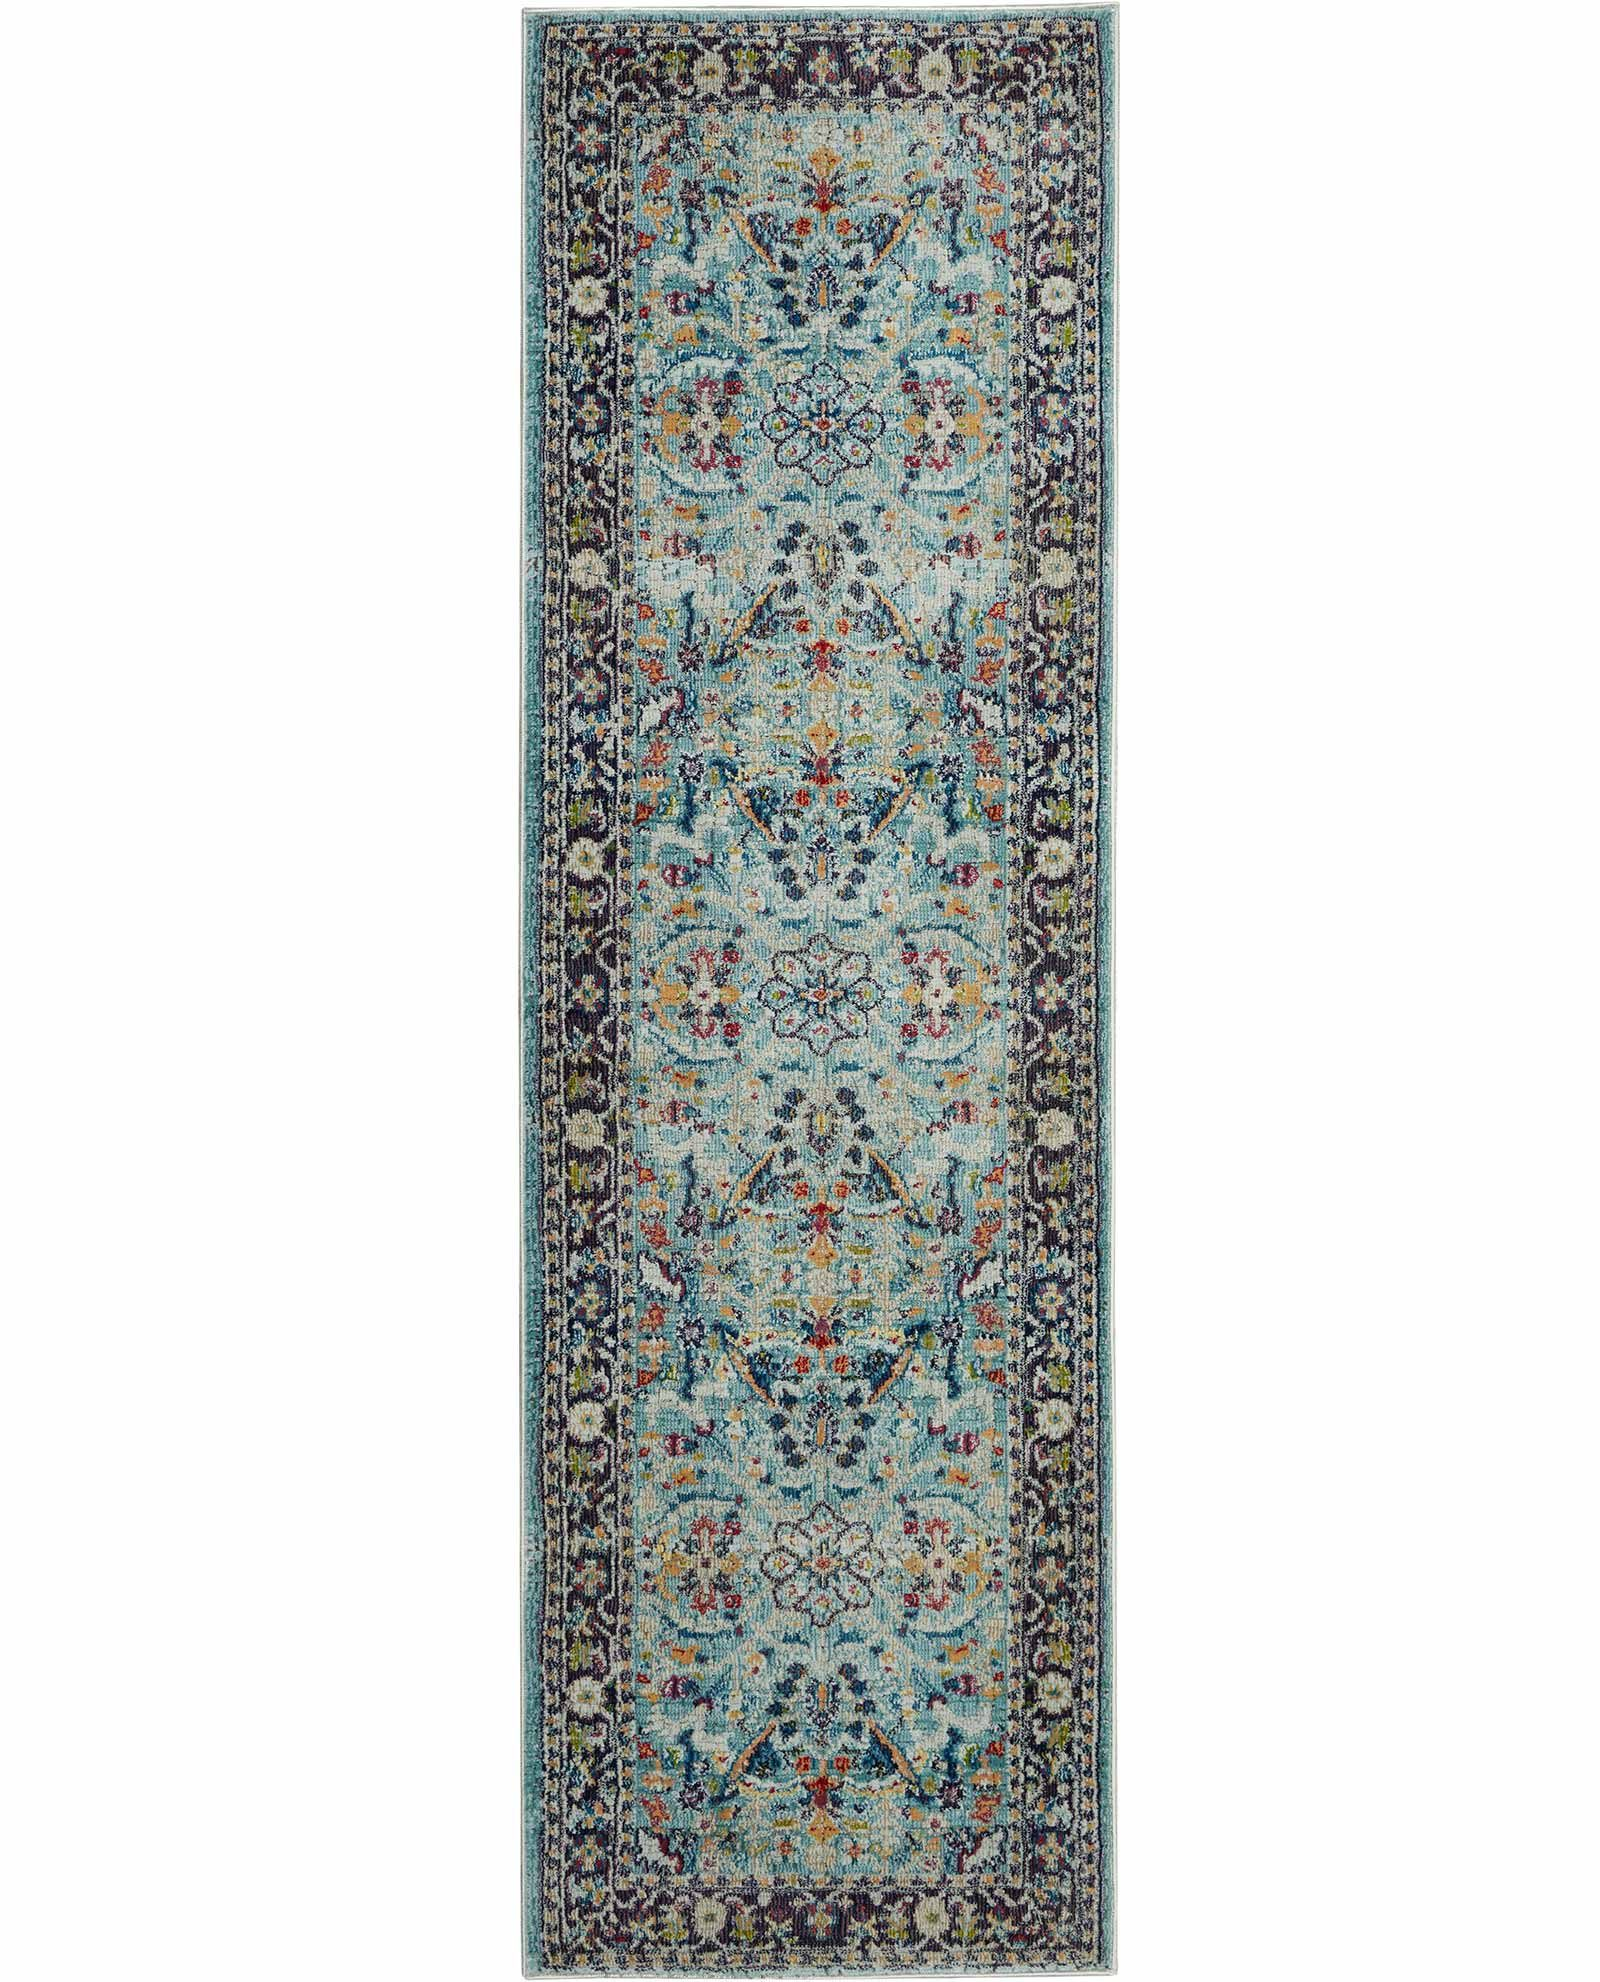 Nourison rug Ankara Global ANR14 TEAL MULTI 2x6 099446498403 flat C